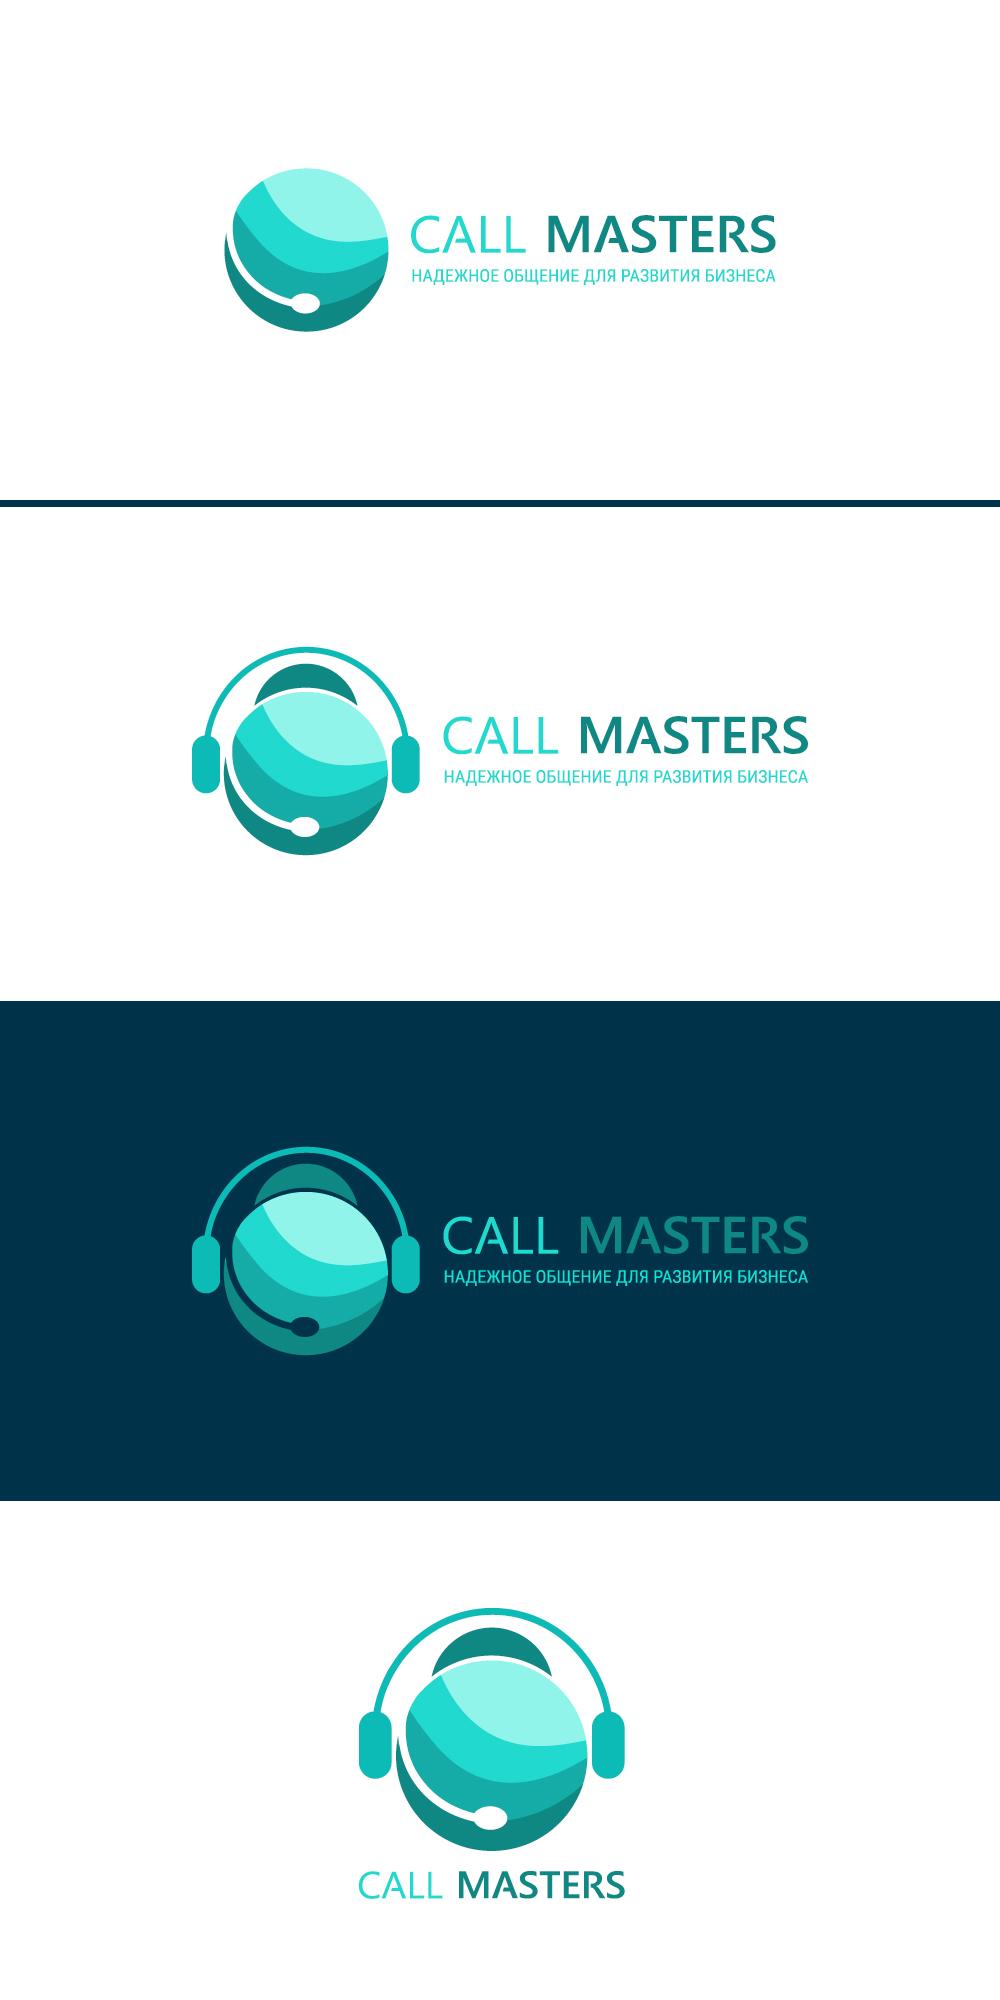 Логотип call-центра Callmasters  фото f_8465b6a2a634aa66.jpg